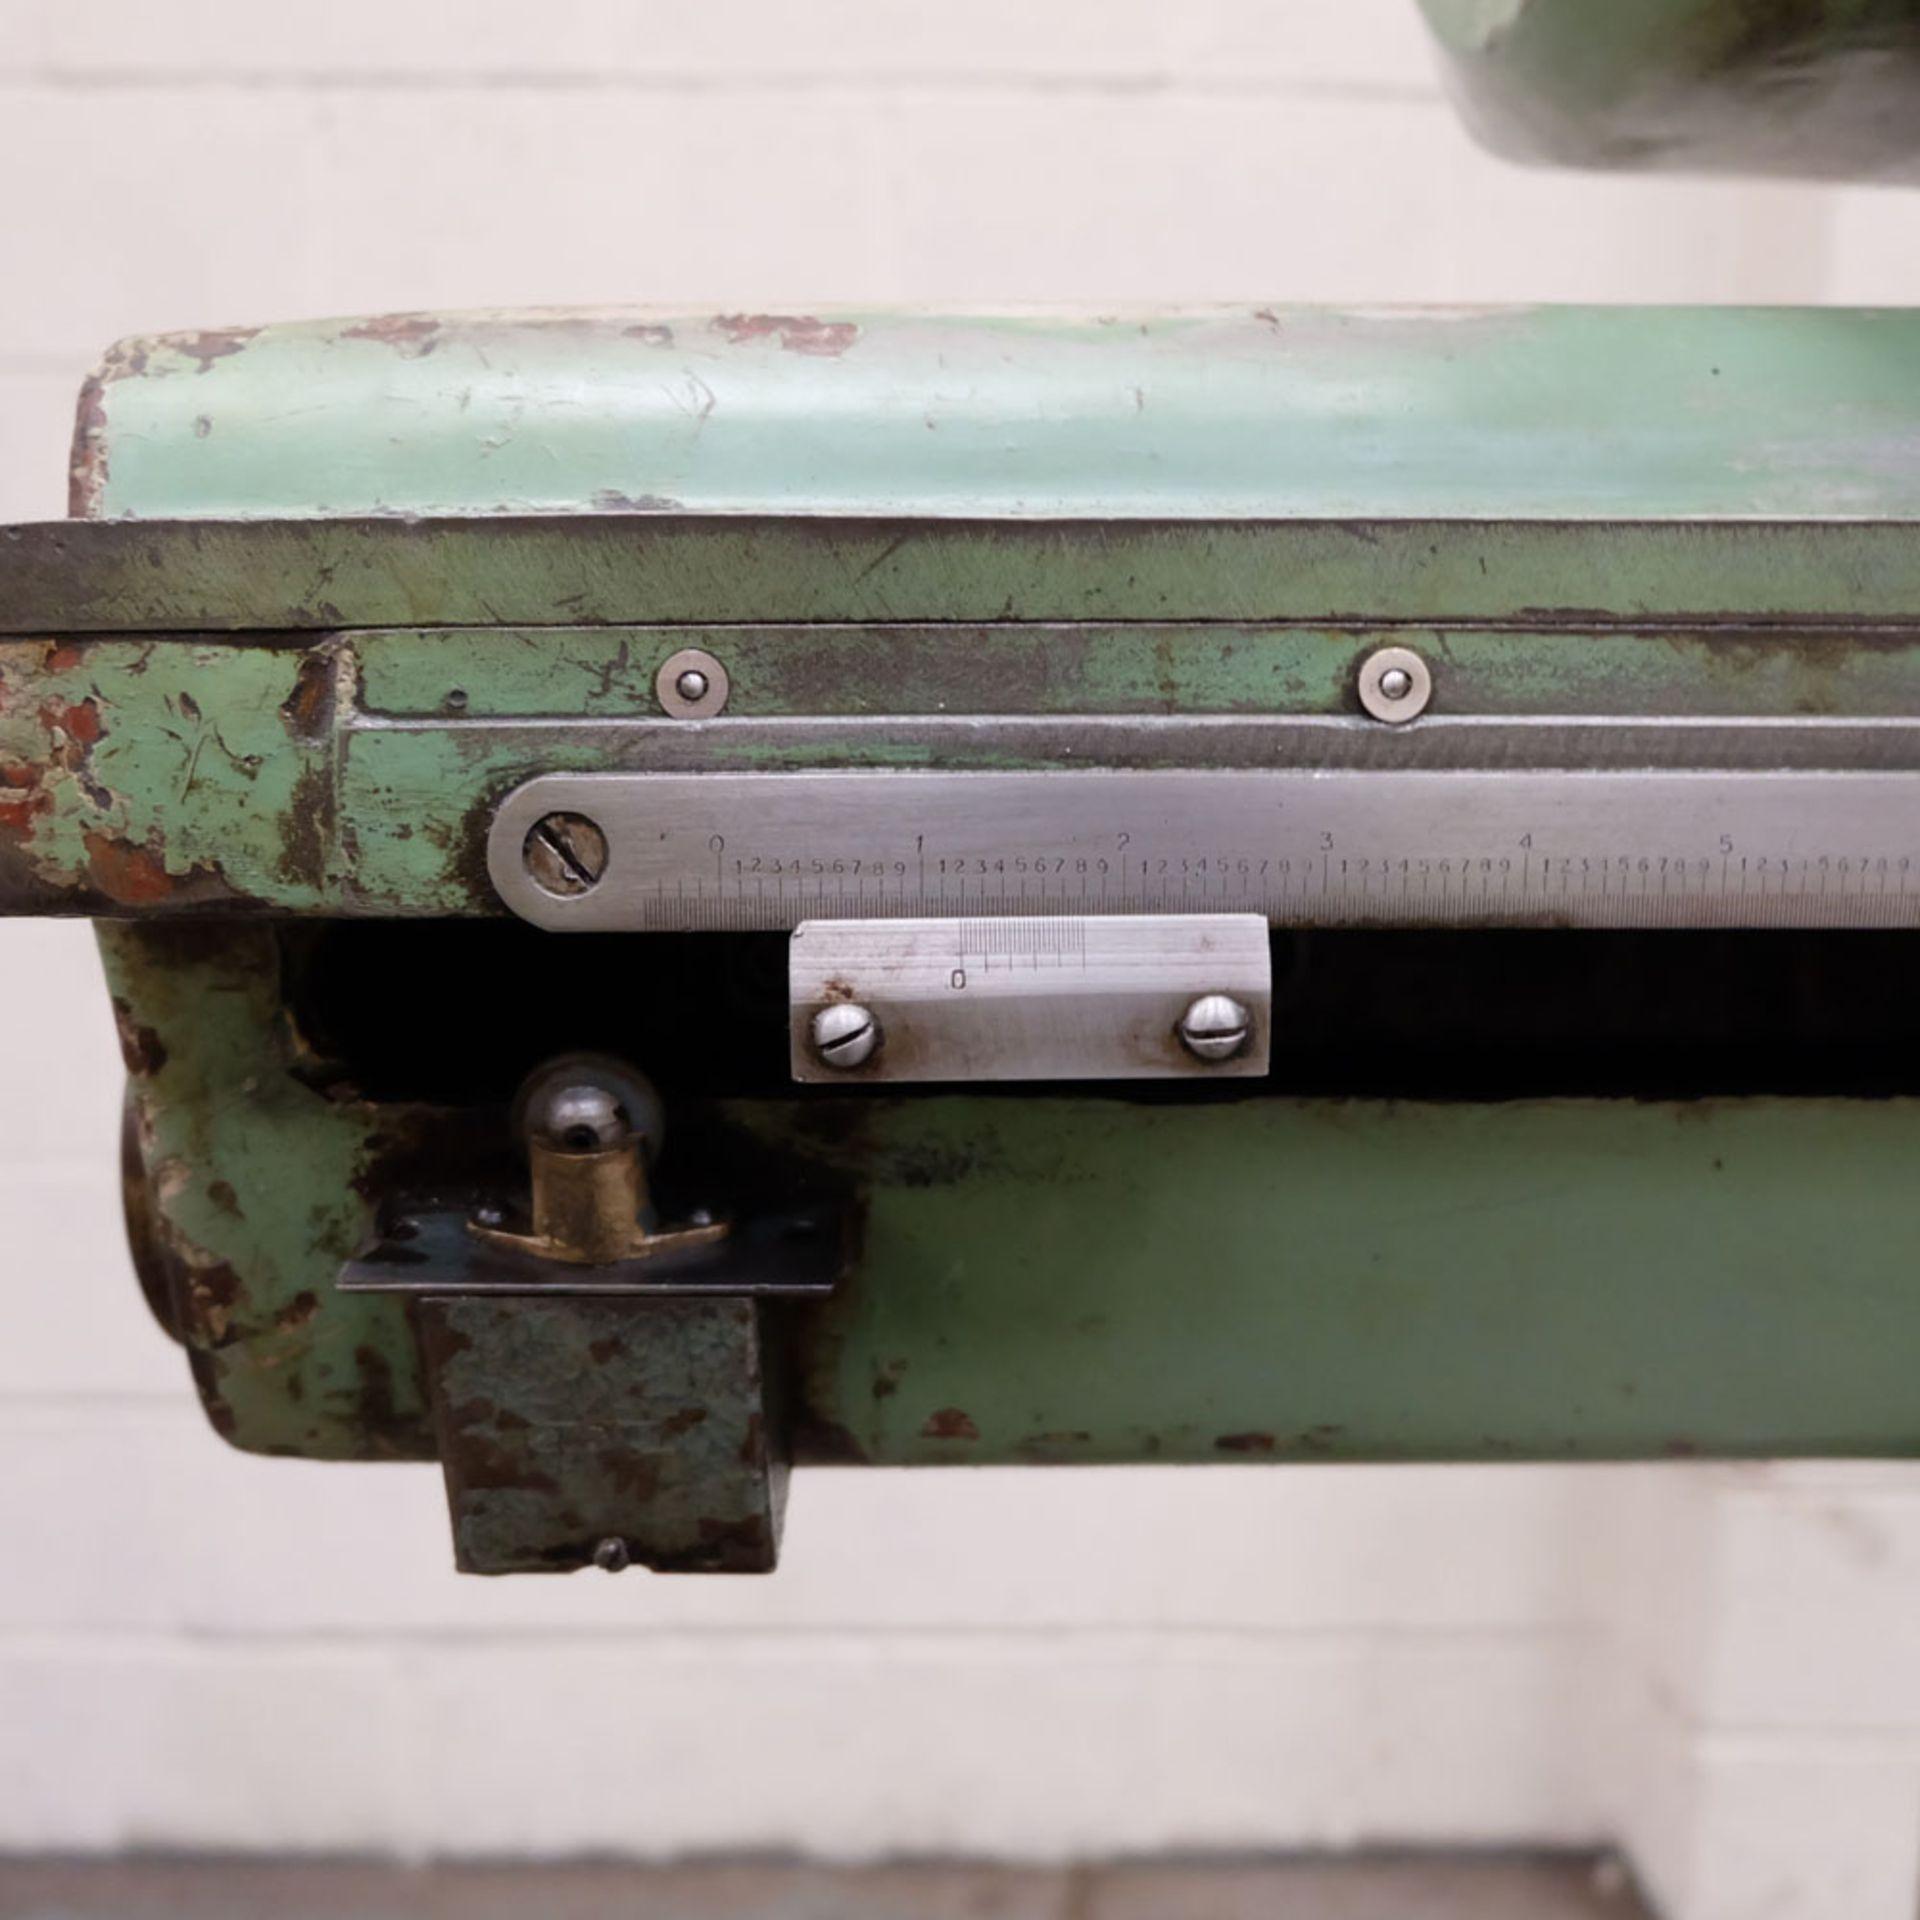 Juaristi Model MDR-55 Horizontal Boring Machine. Spindle Size: 55mm Dia. Spindle Bore: No.4 MT. - Image 12 of 14